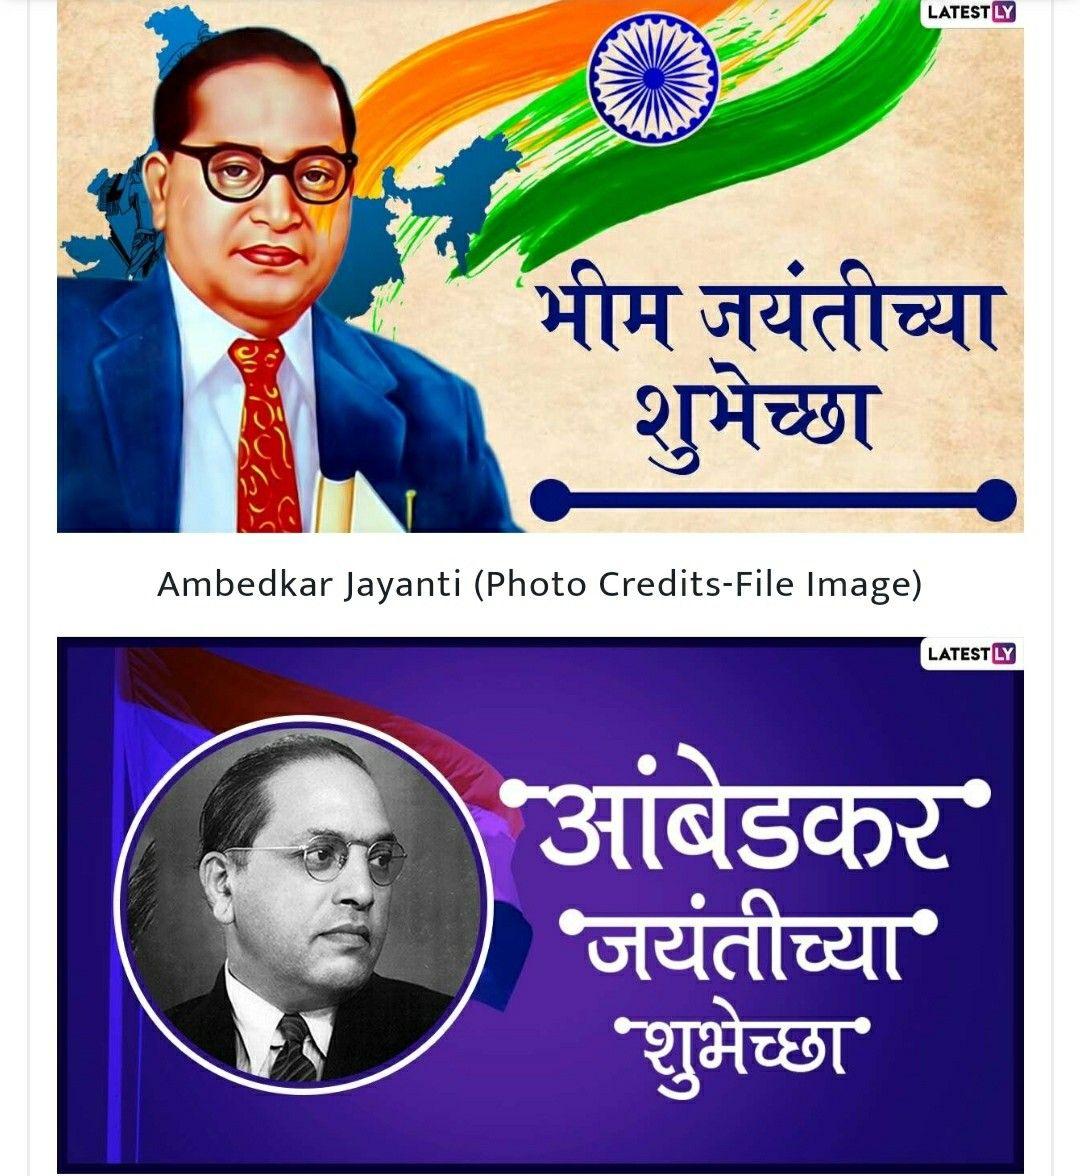 B R Ambedkar In 2020 File Image Photo Image